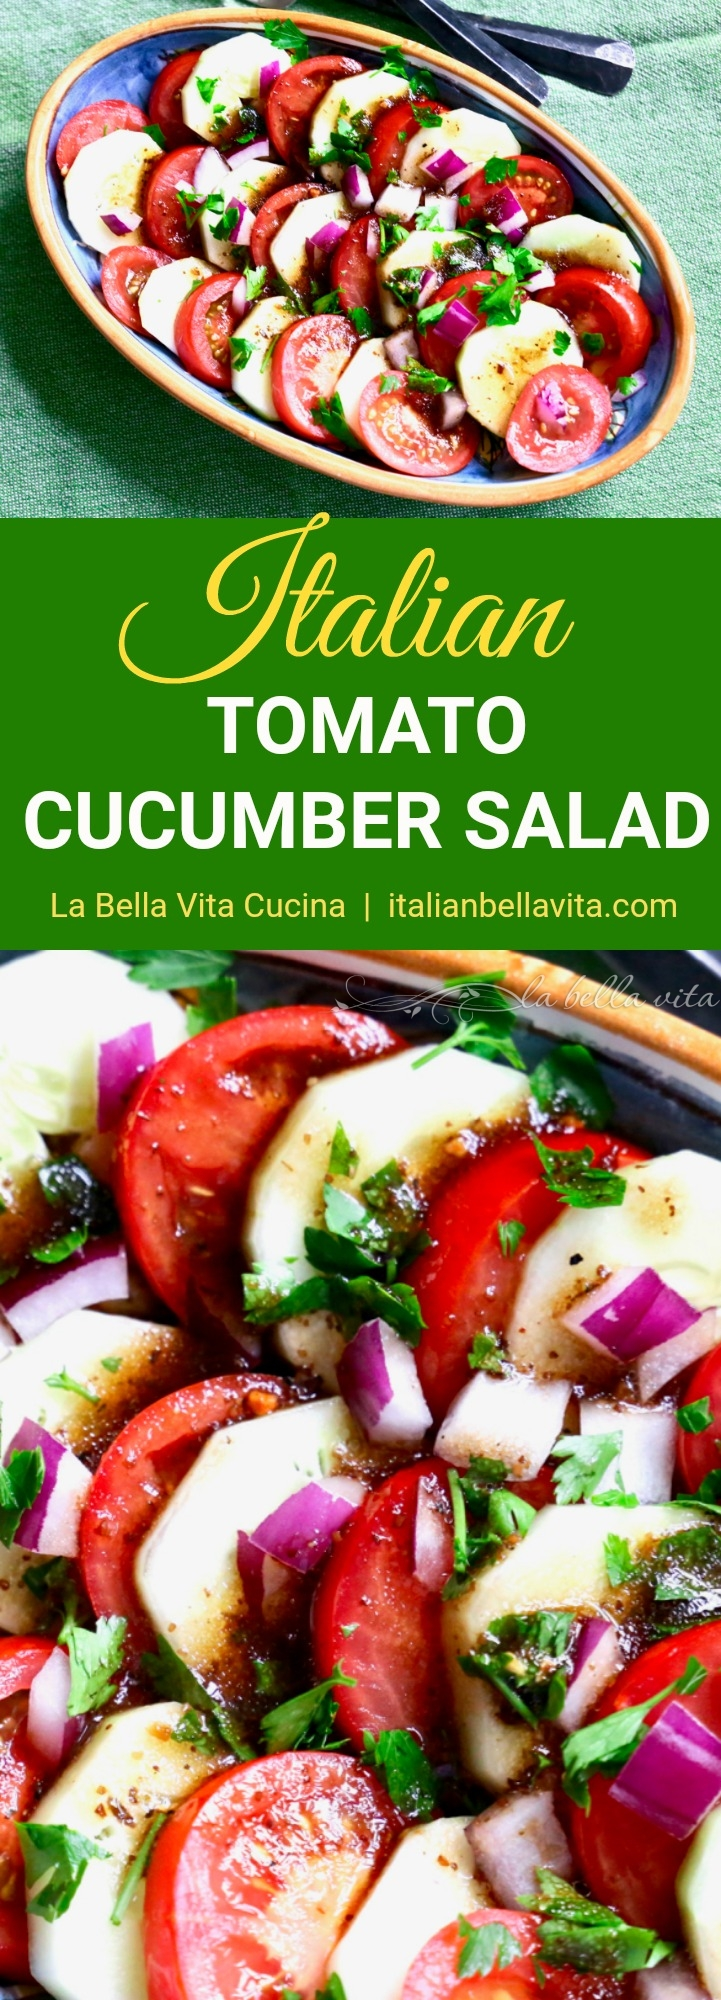 Classic Italian Tomato and Cucumber Salad